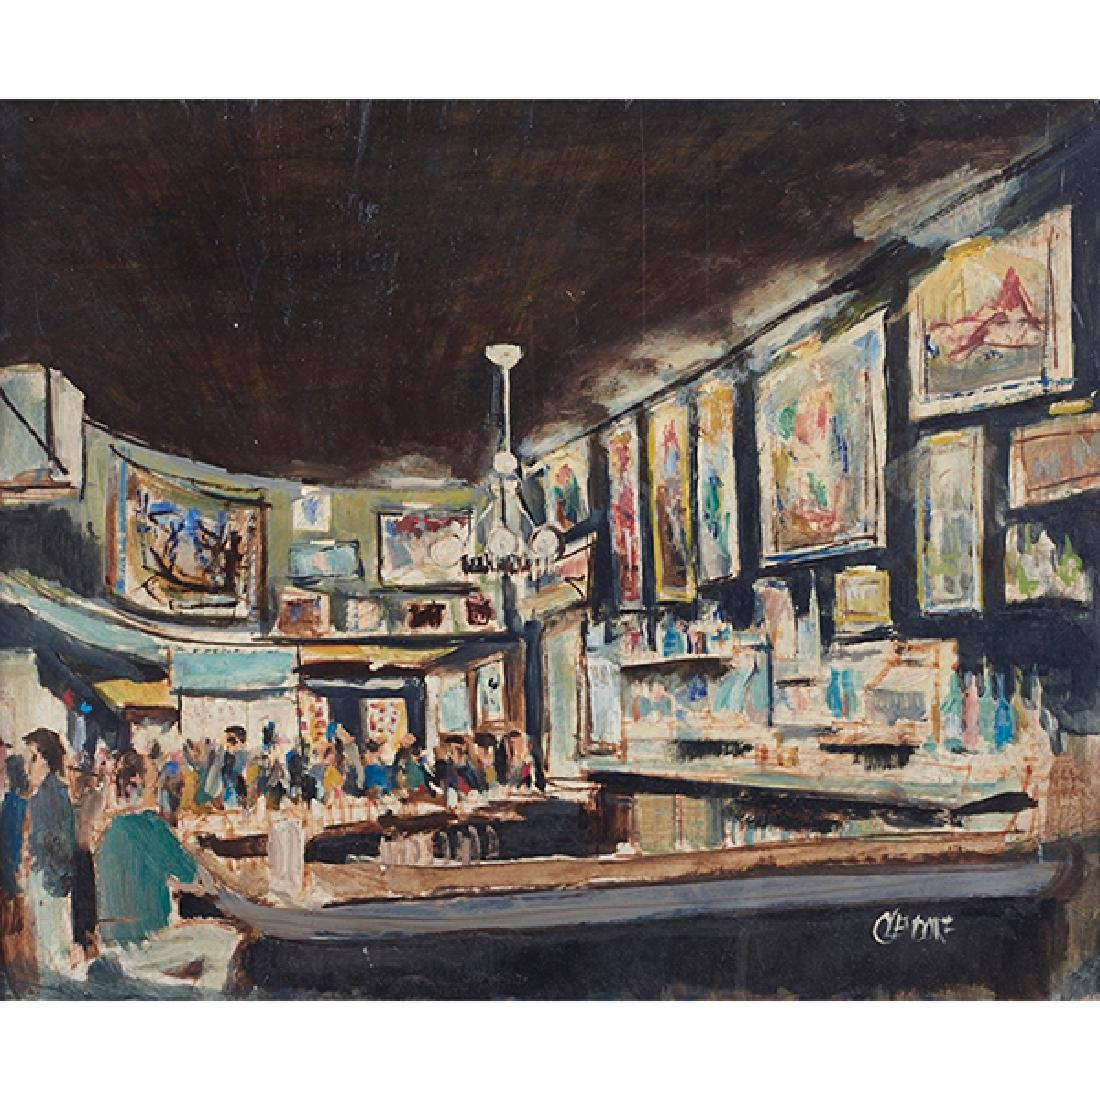 Bill Olendorf, (American, 1924-1996), Butch McGuire's,